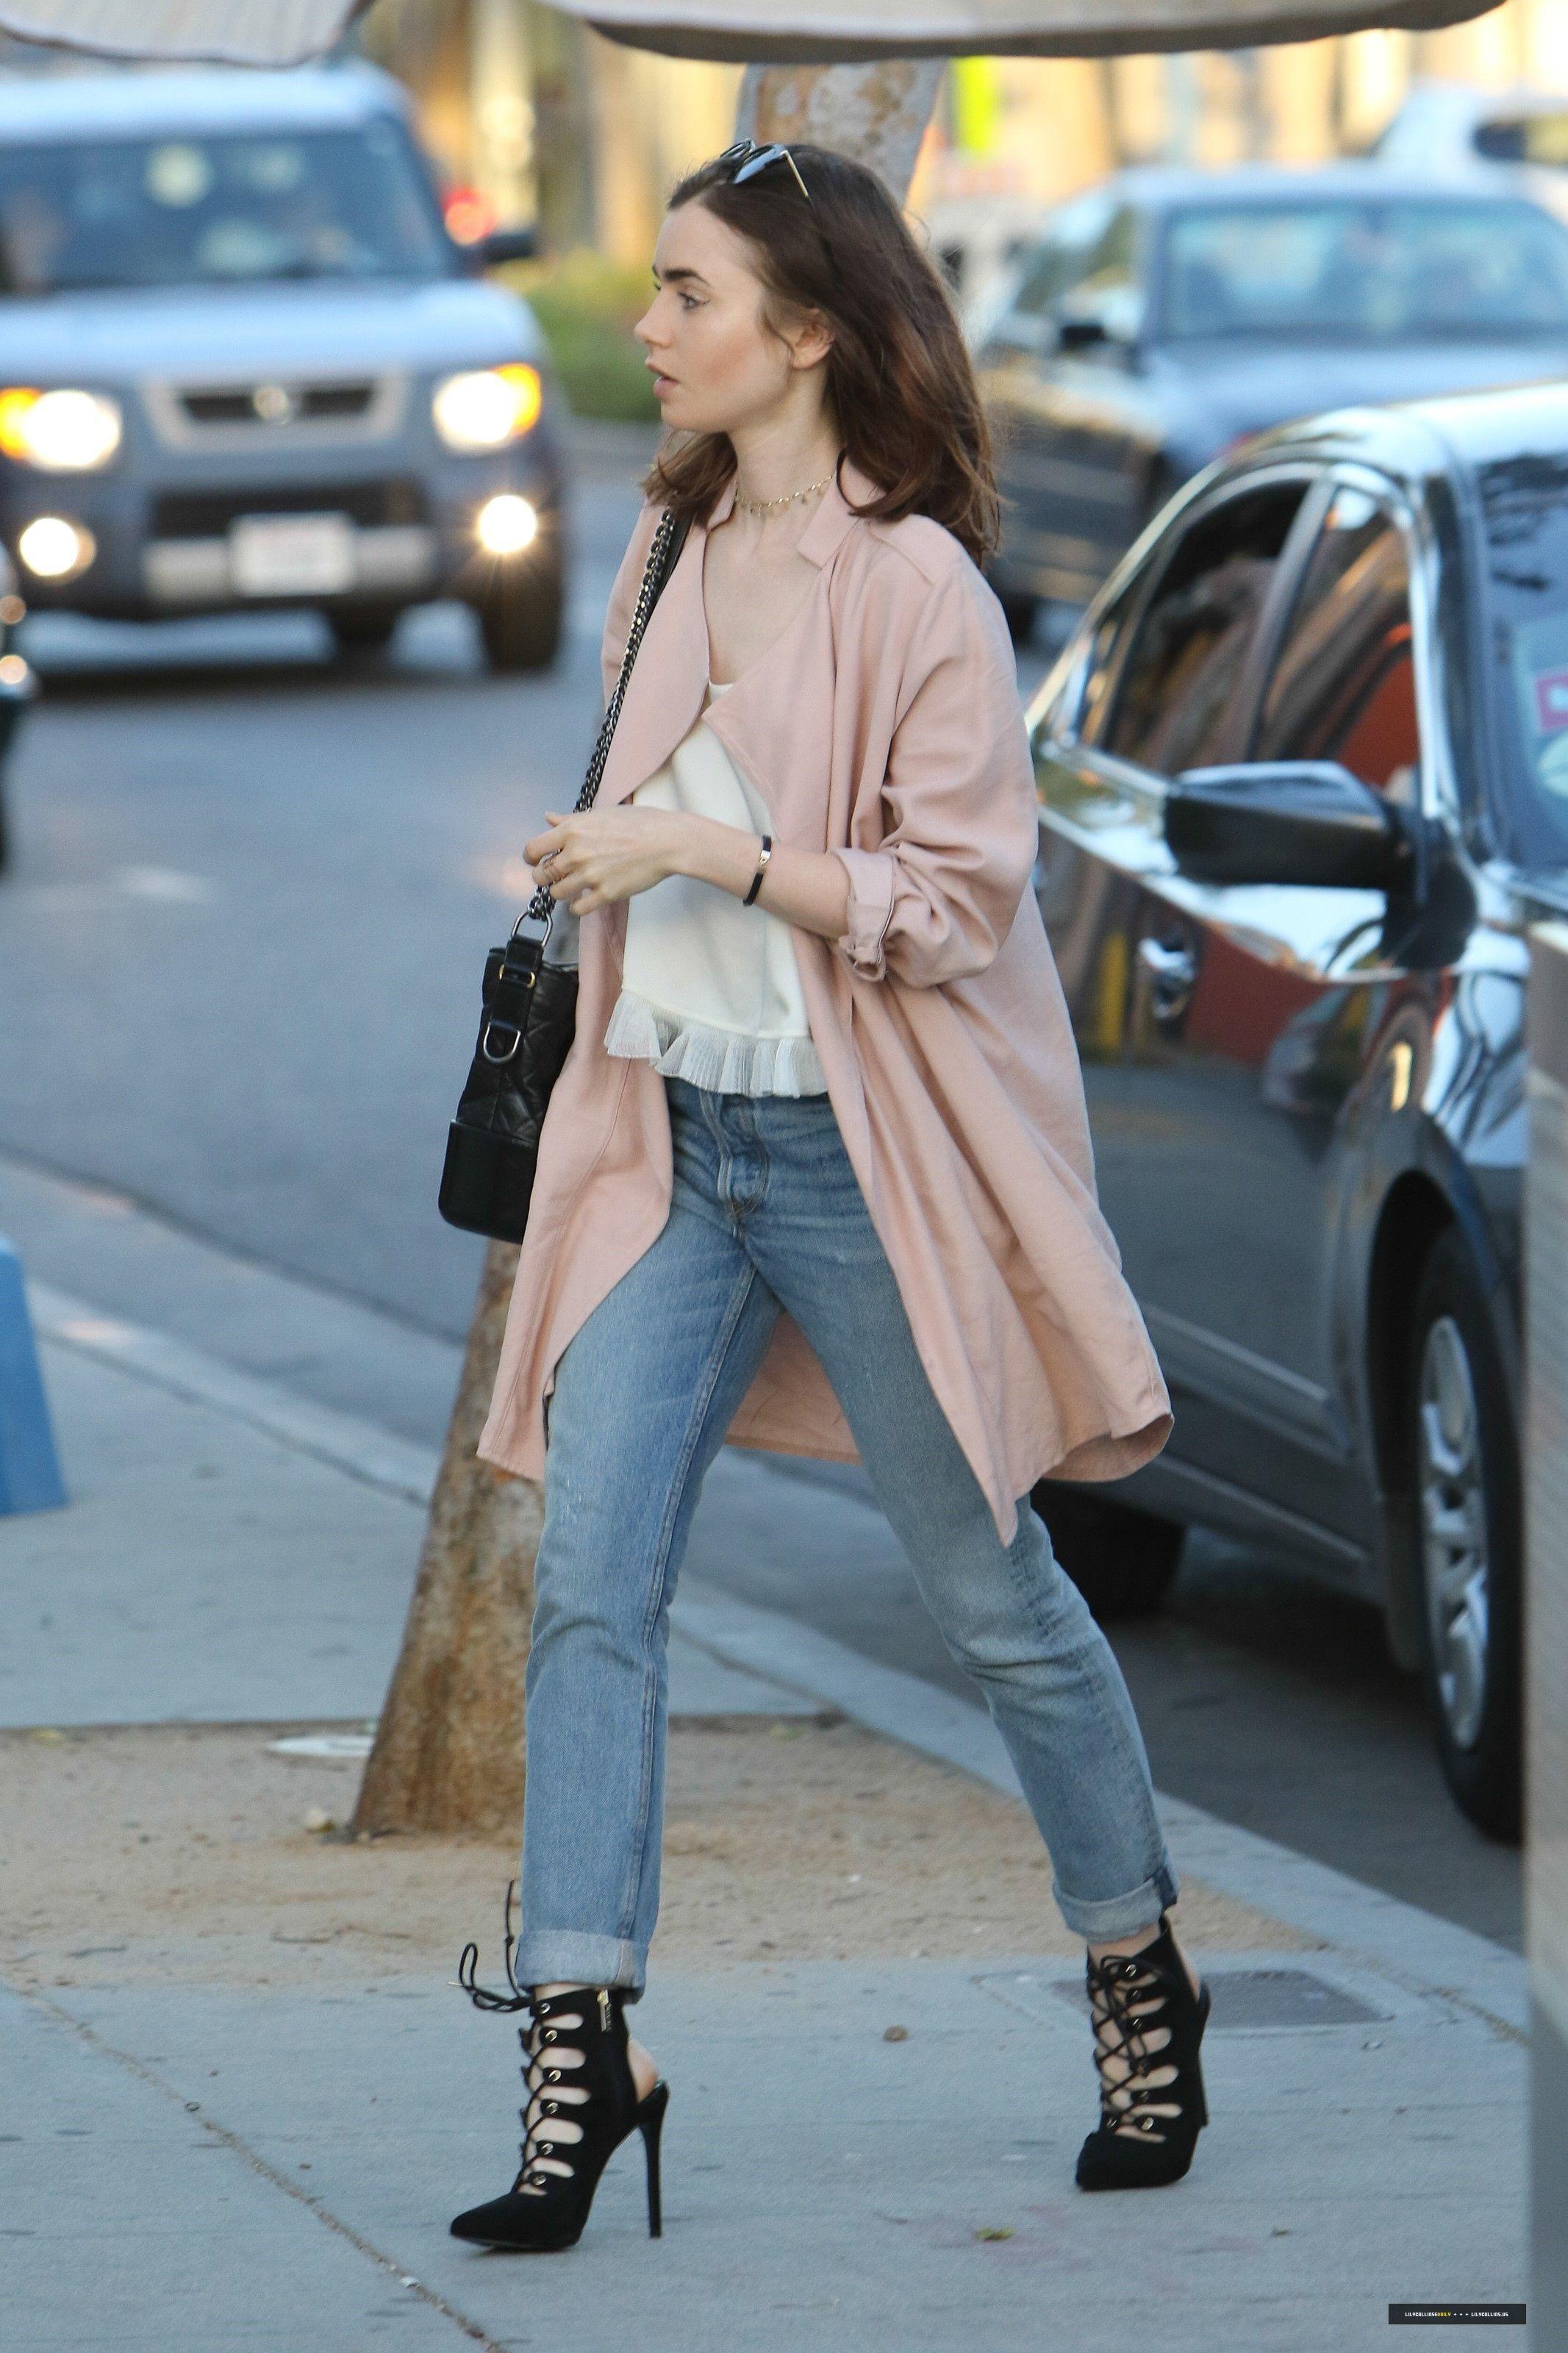 3a3155a52302 Pinterest: KarinaCamerino Lily Collins Casual, Lily Collins Style, Lily  Collins Fashion, Star